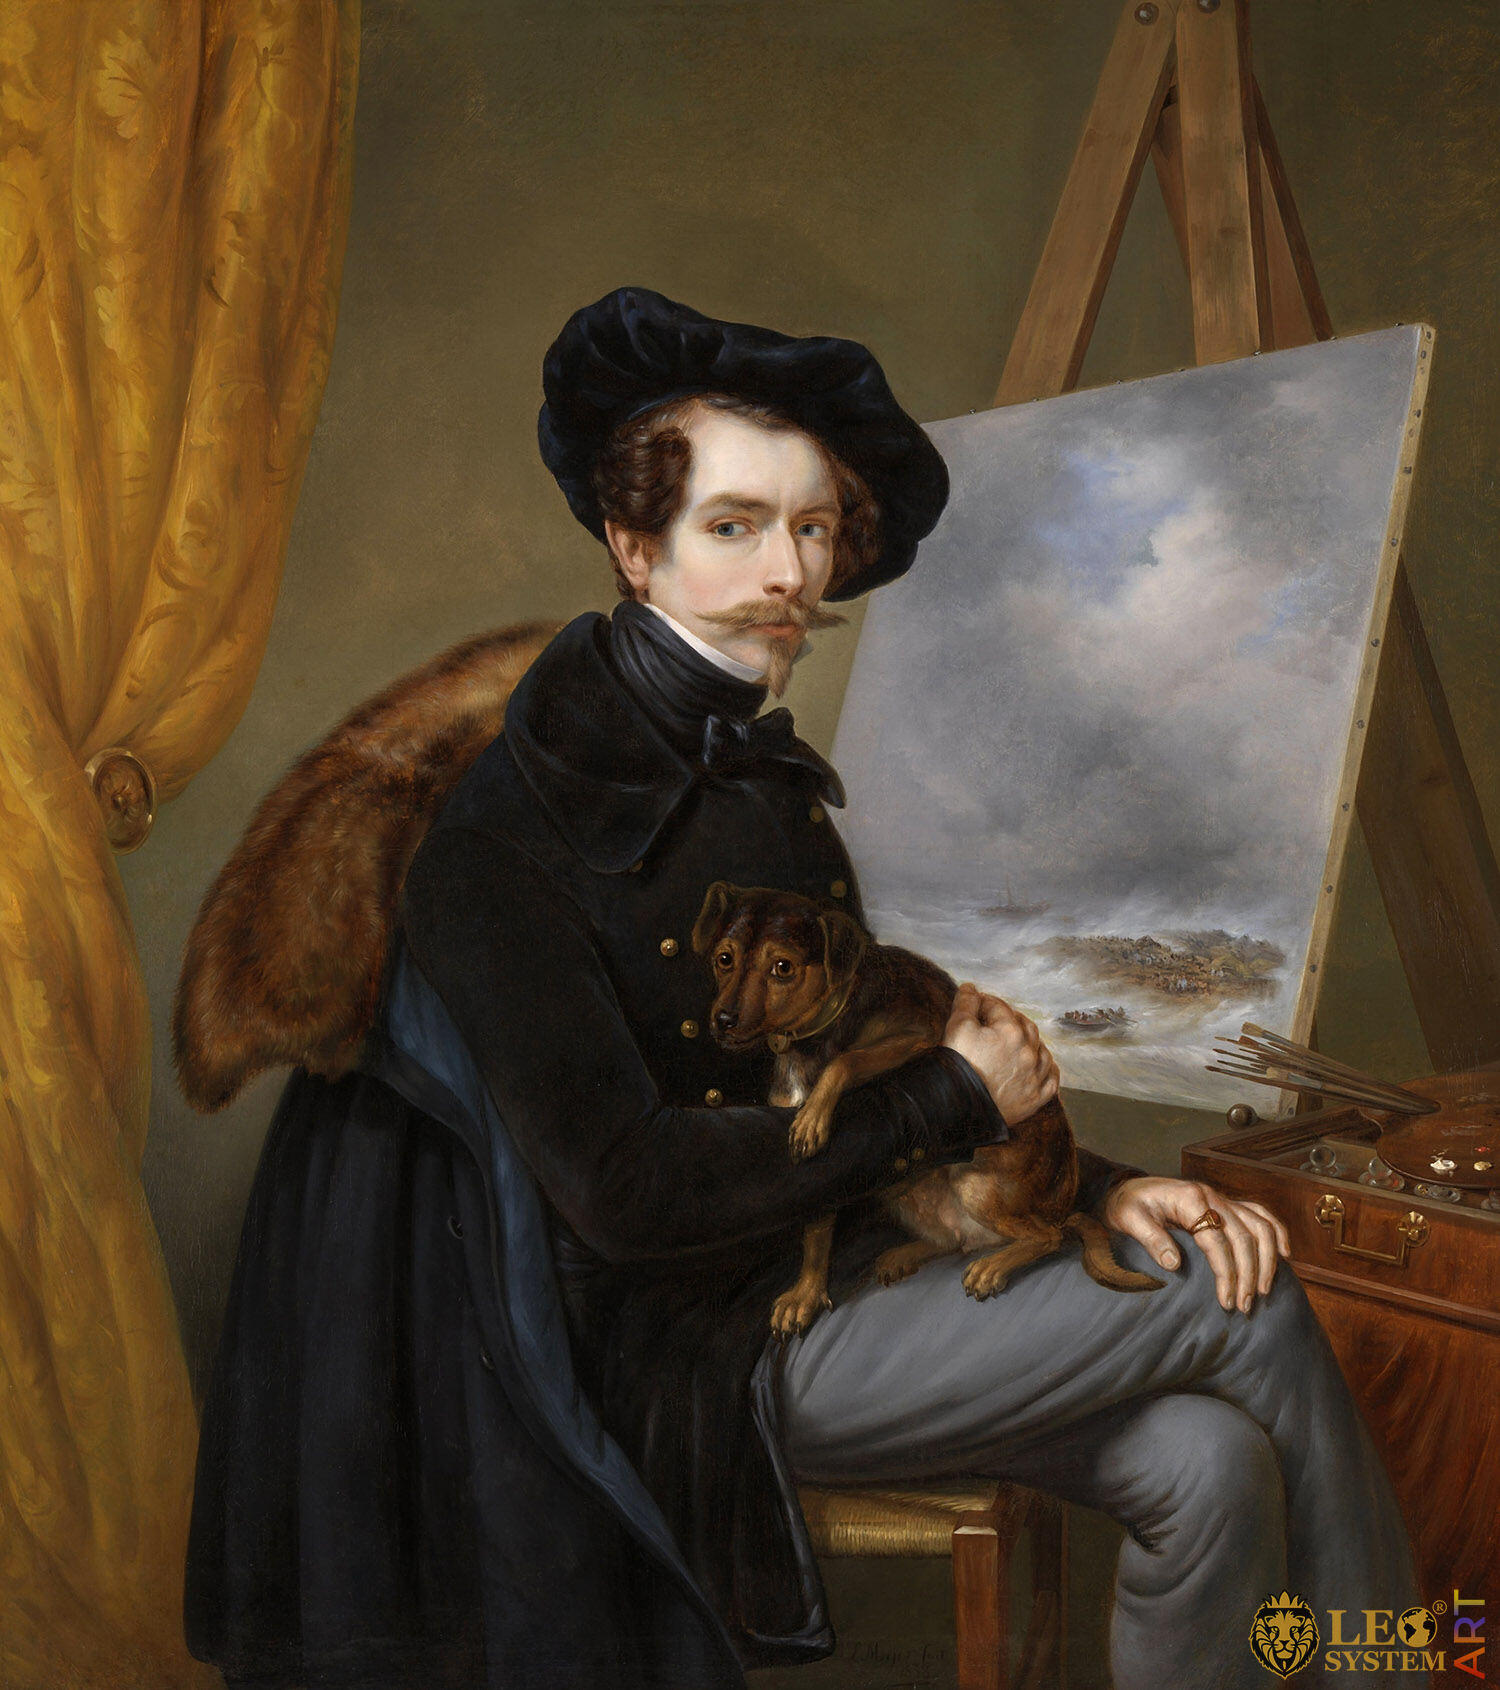 Self-Portrait, Louis Meijer, Painter: Johan Hendrik Louis Meijer, 1838, Amsterdam, Netherlands, Original painting